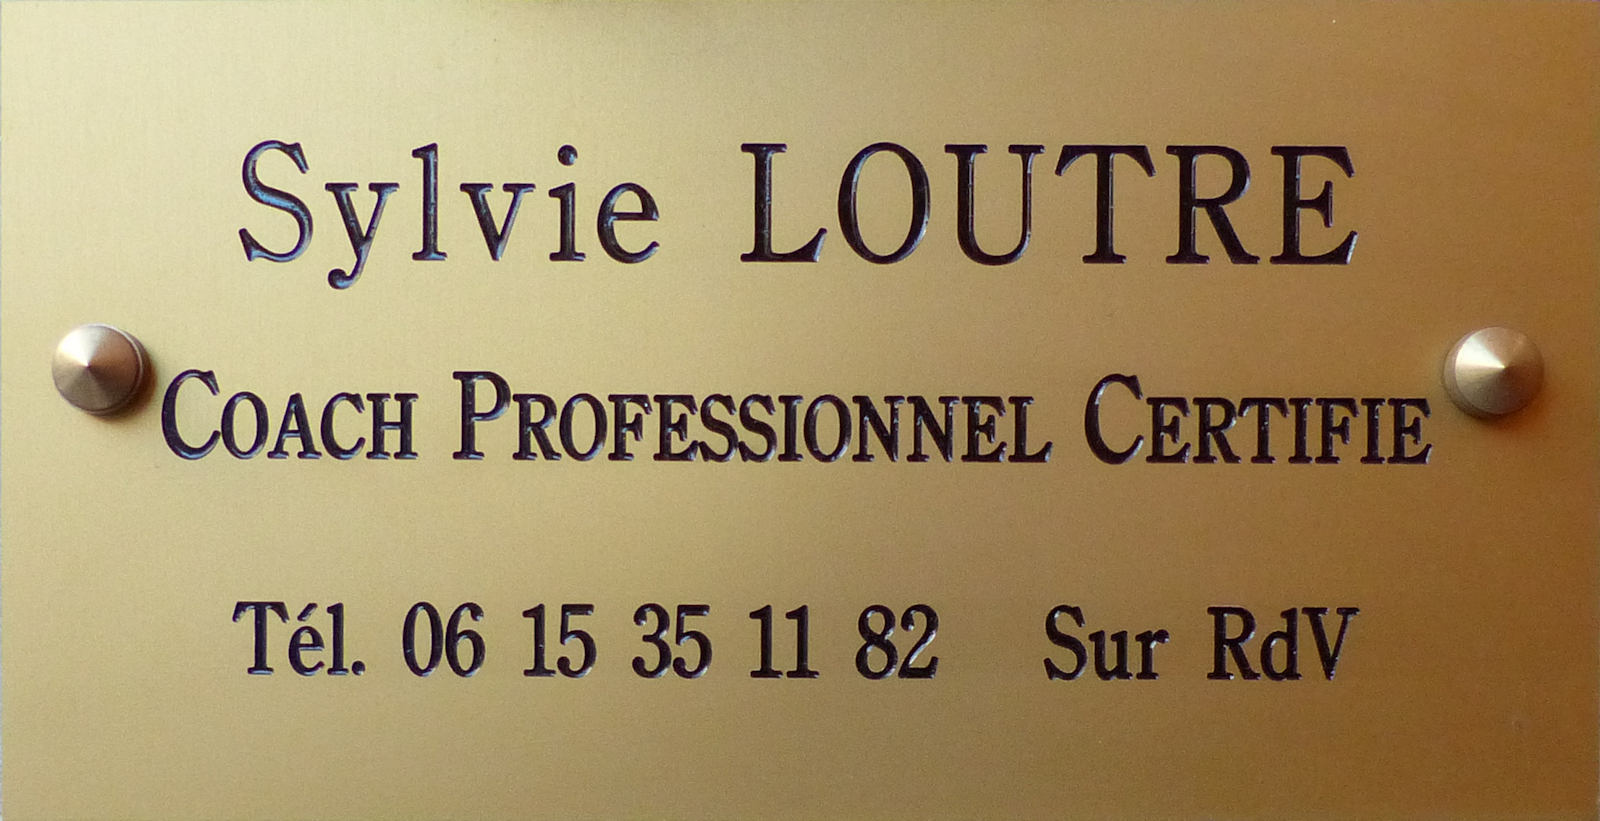 Sylvie Loutre - Coach professionnel, Tourcoing